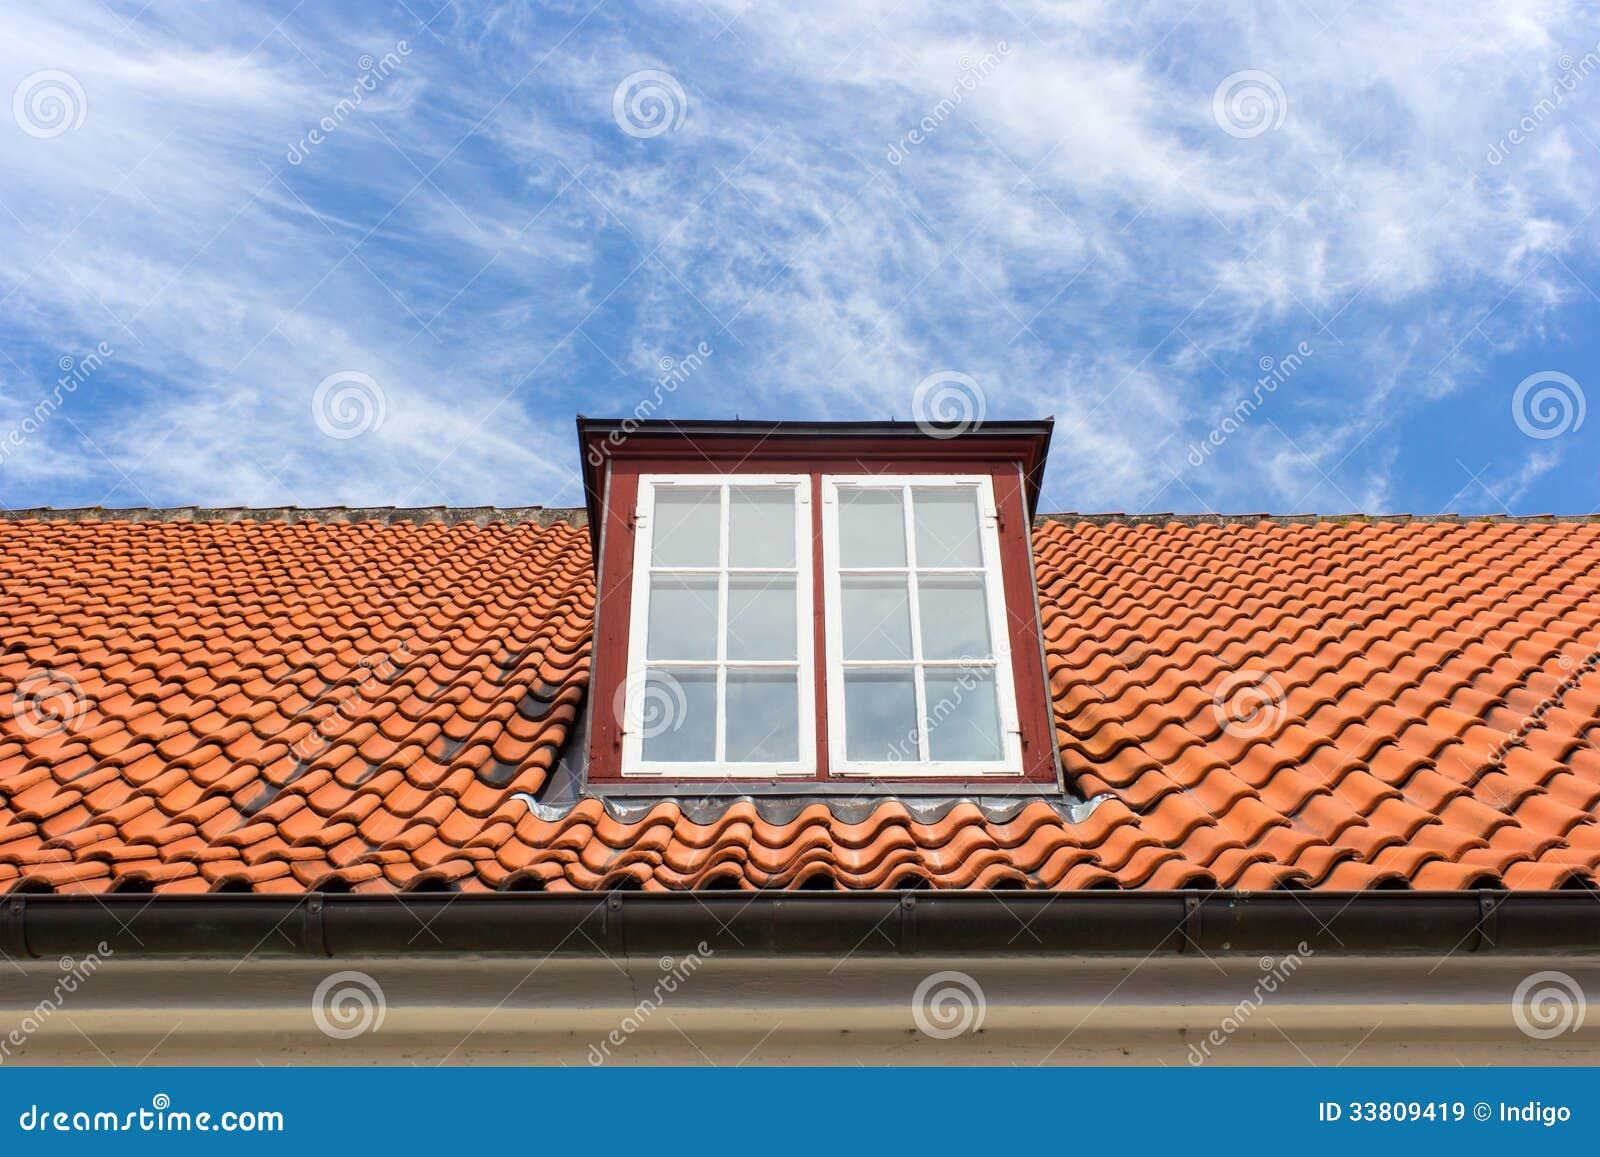 toit rouge avec une lucarne image stock image du ciel toiture 33809419. Black Bedroom Furniture Sets. Home Design Ideas